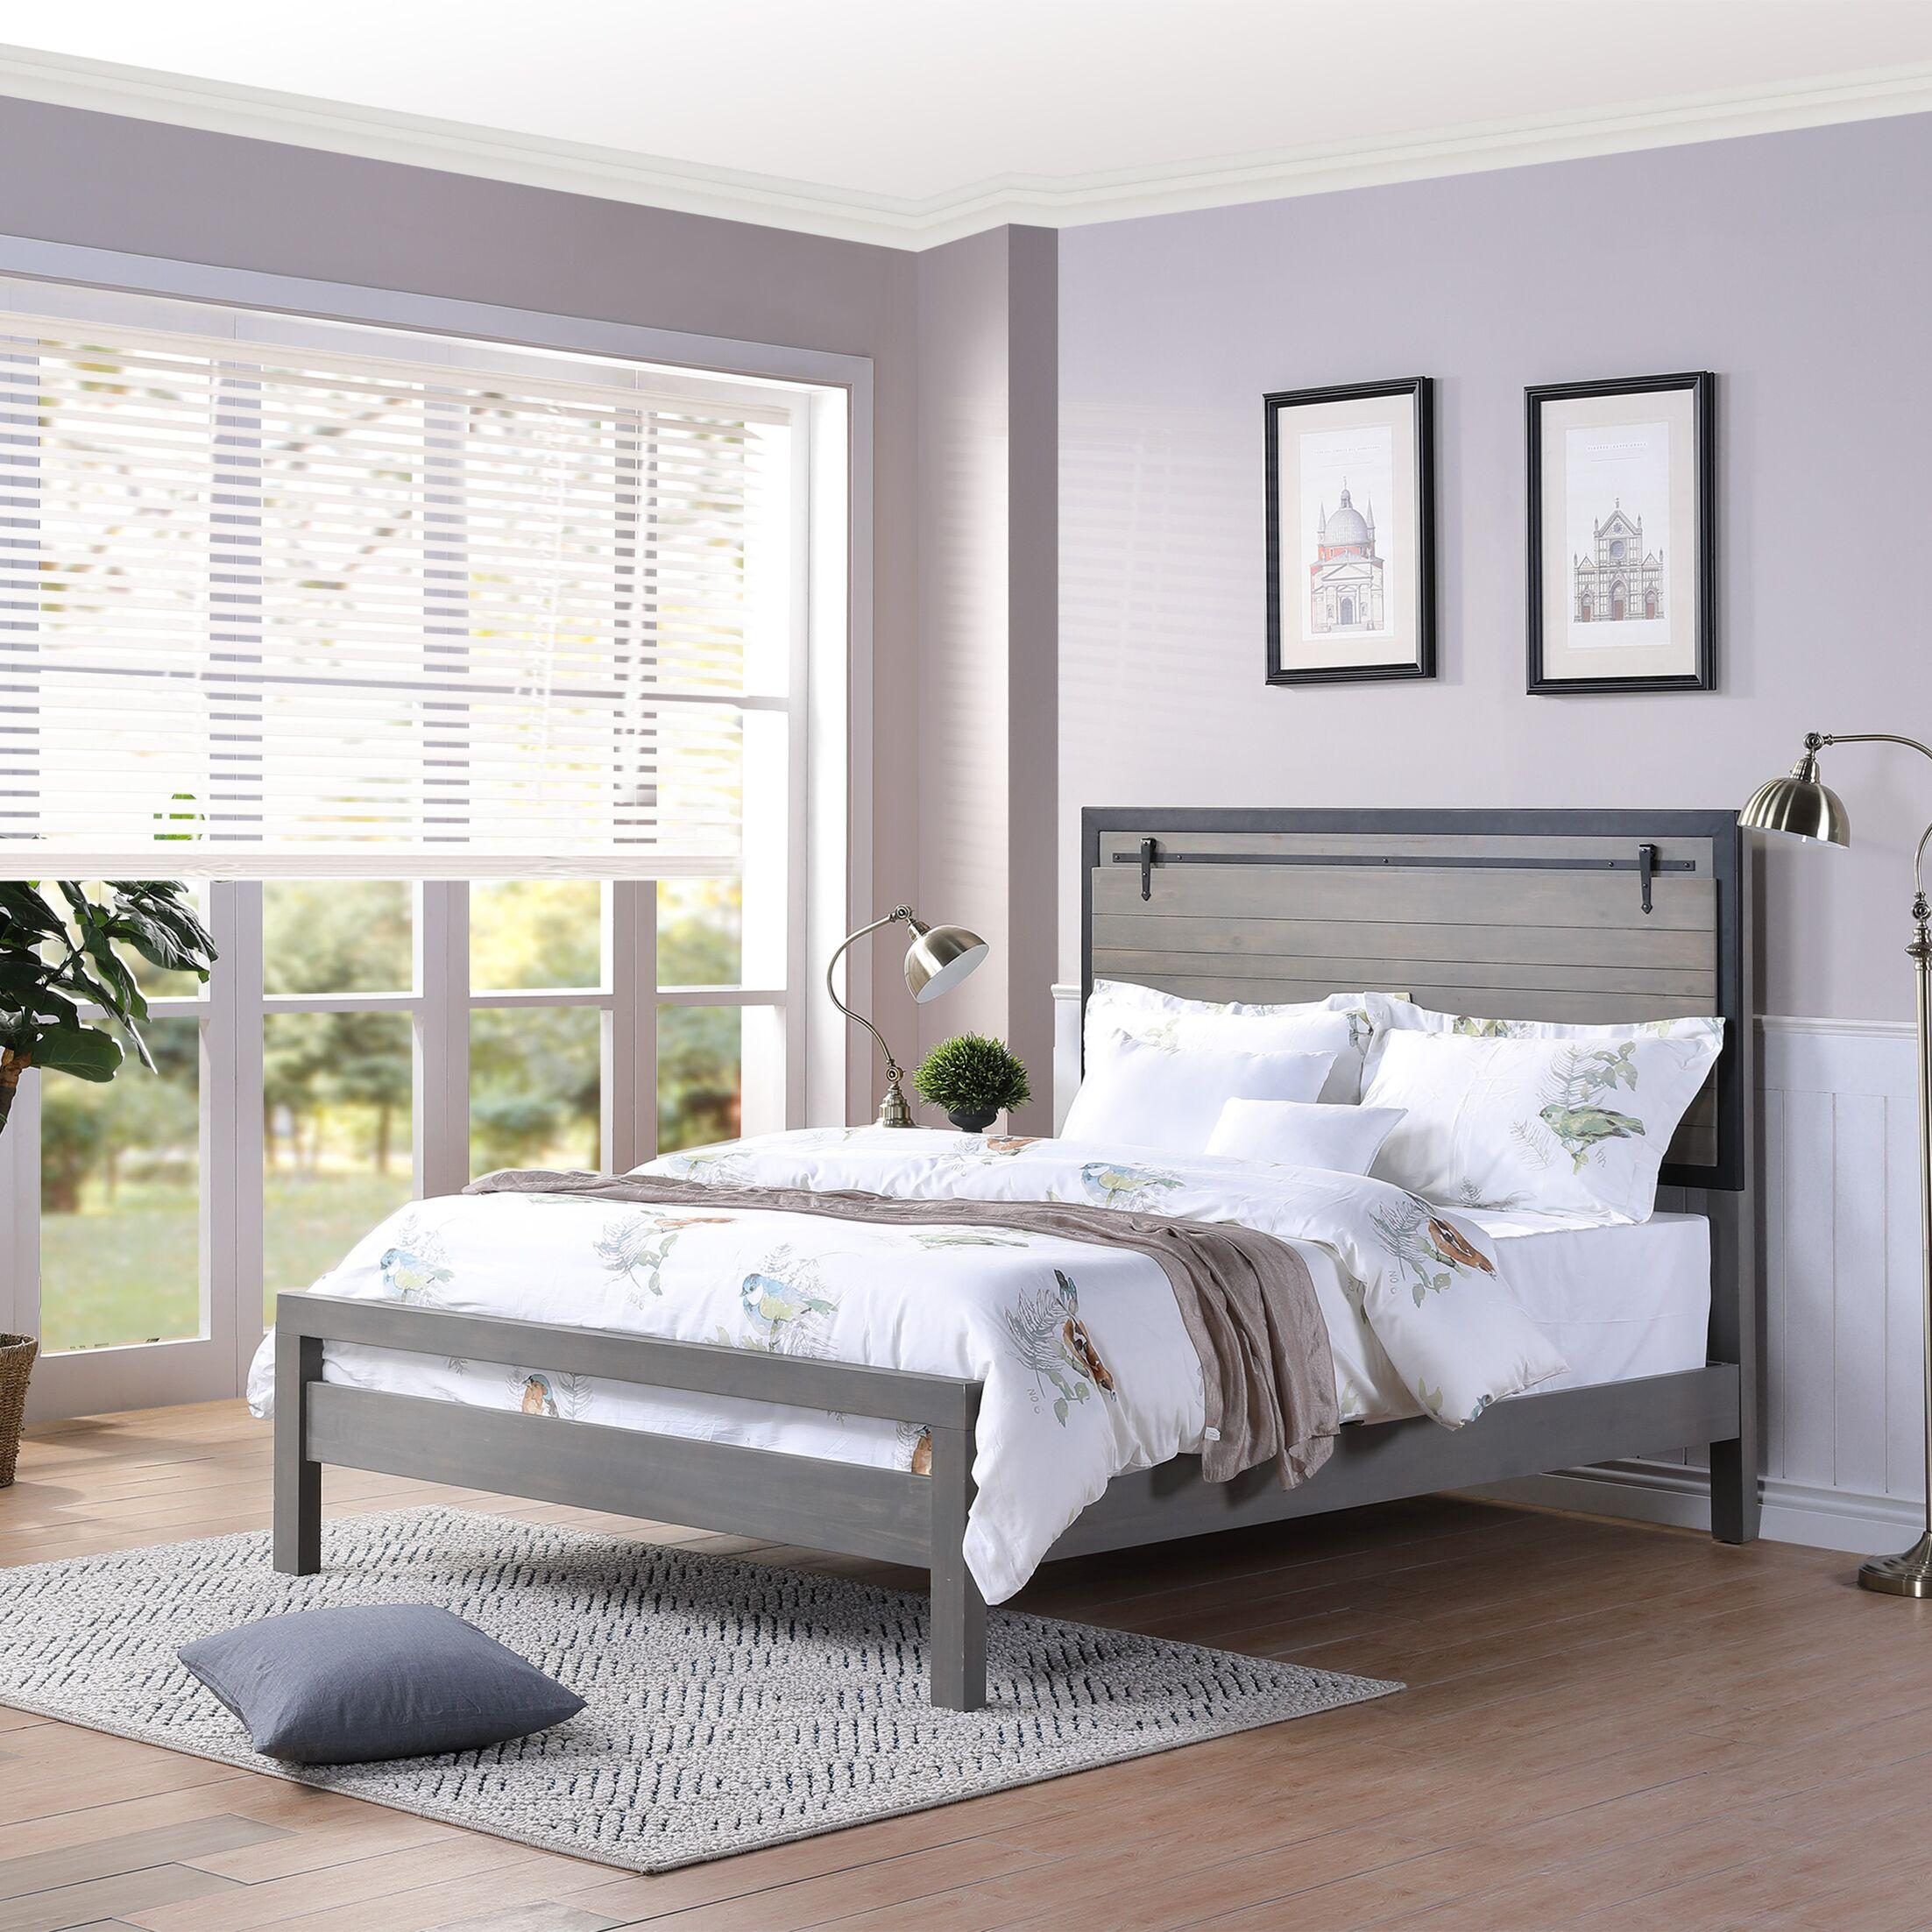 Alpert Bed frame Color: Gray and Black